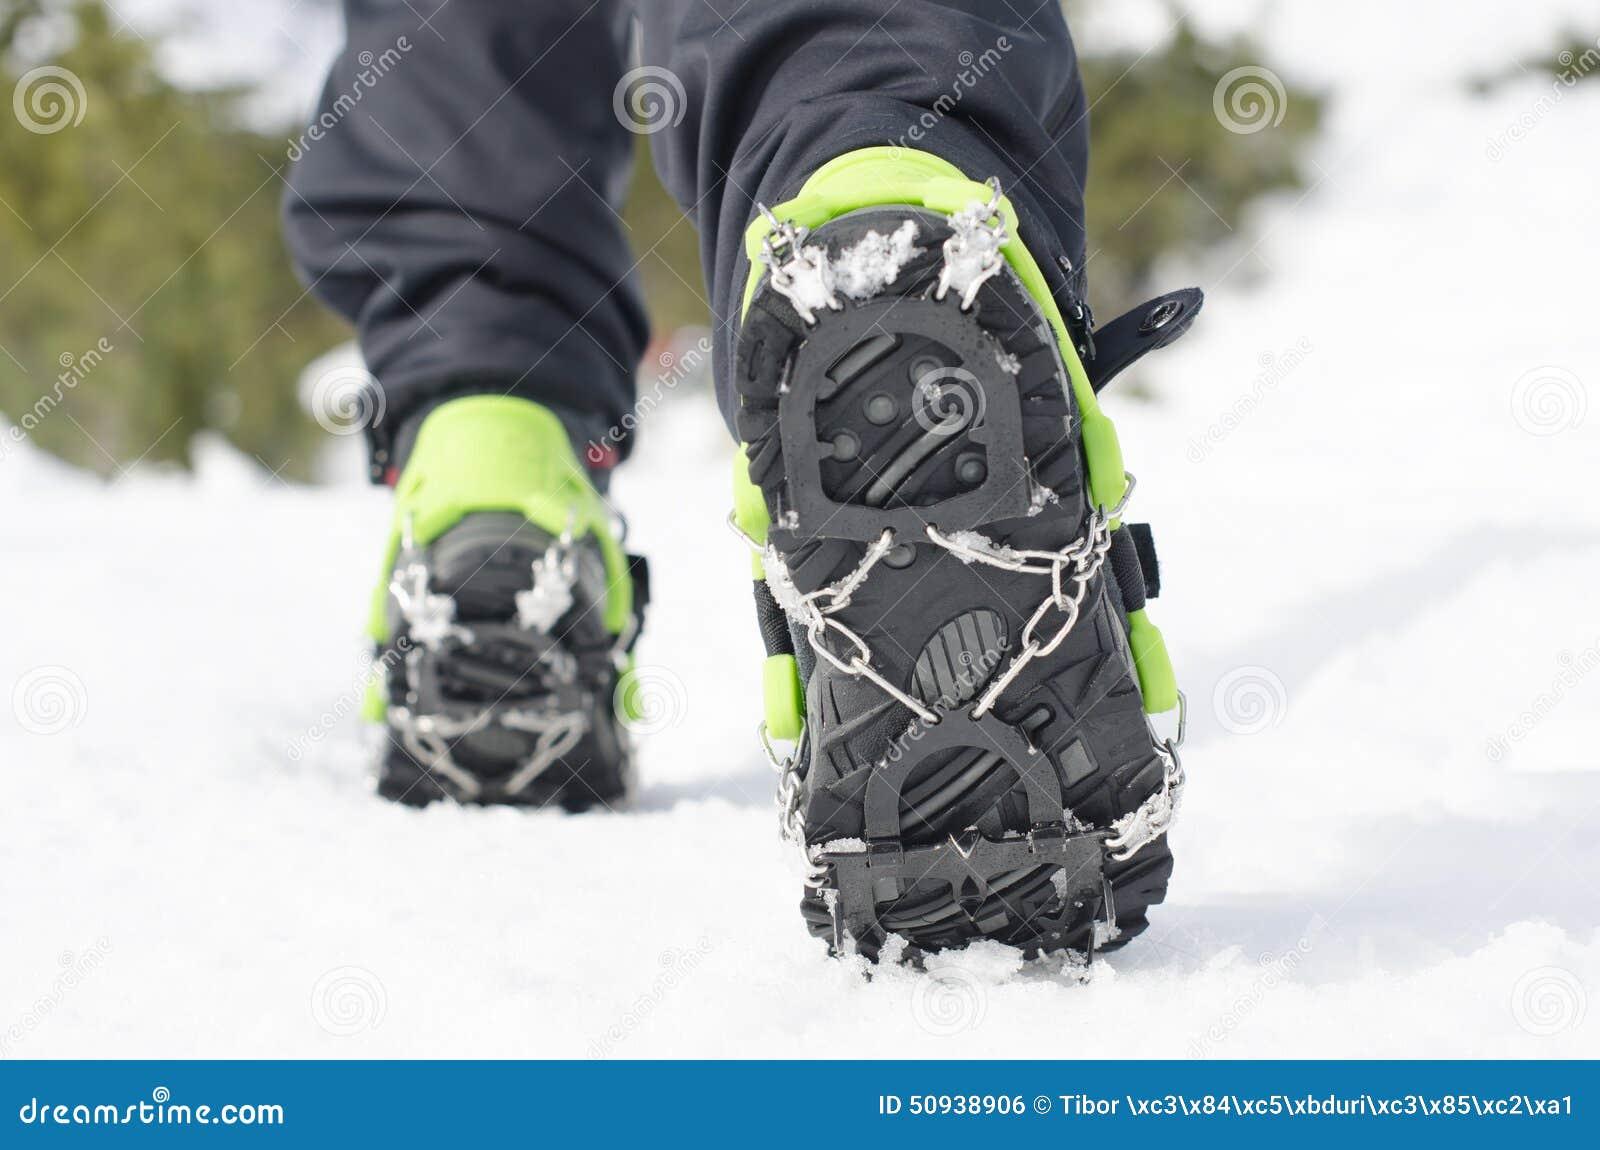 8266cb2edd8 Μπότες πεζοπορίας με το Crampon, εξοπλισμός για την αναρρίχηση πάγου ...